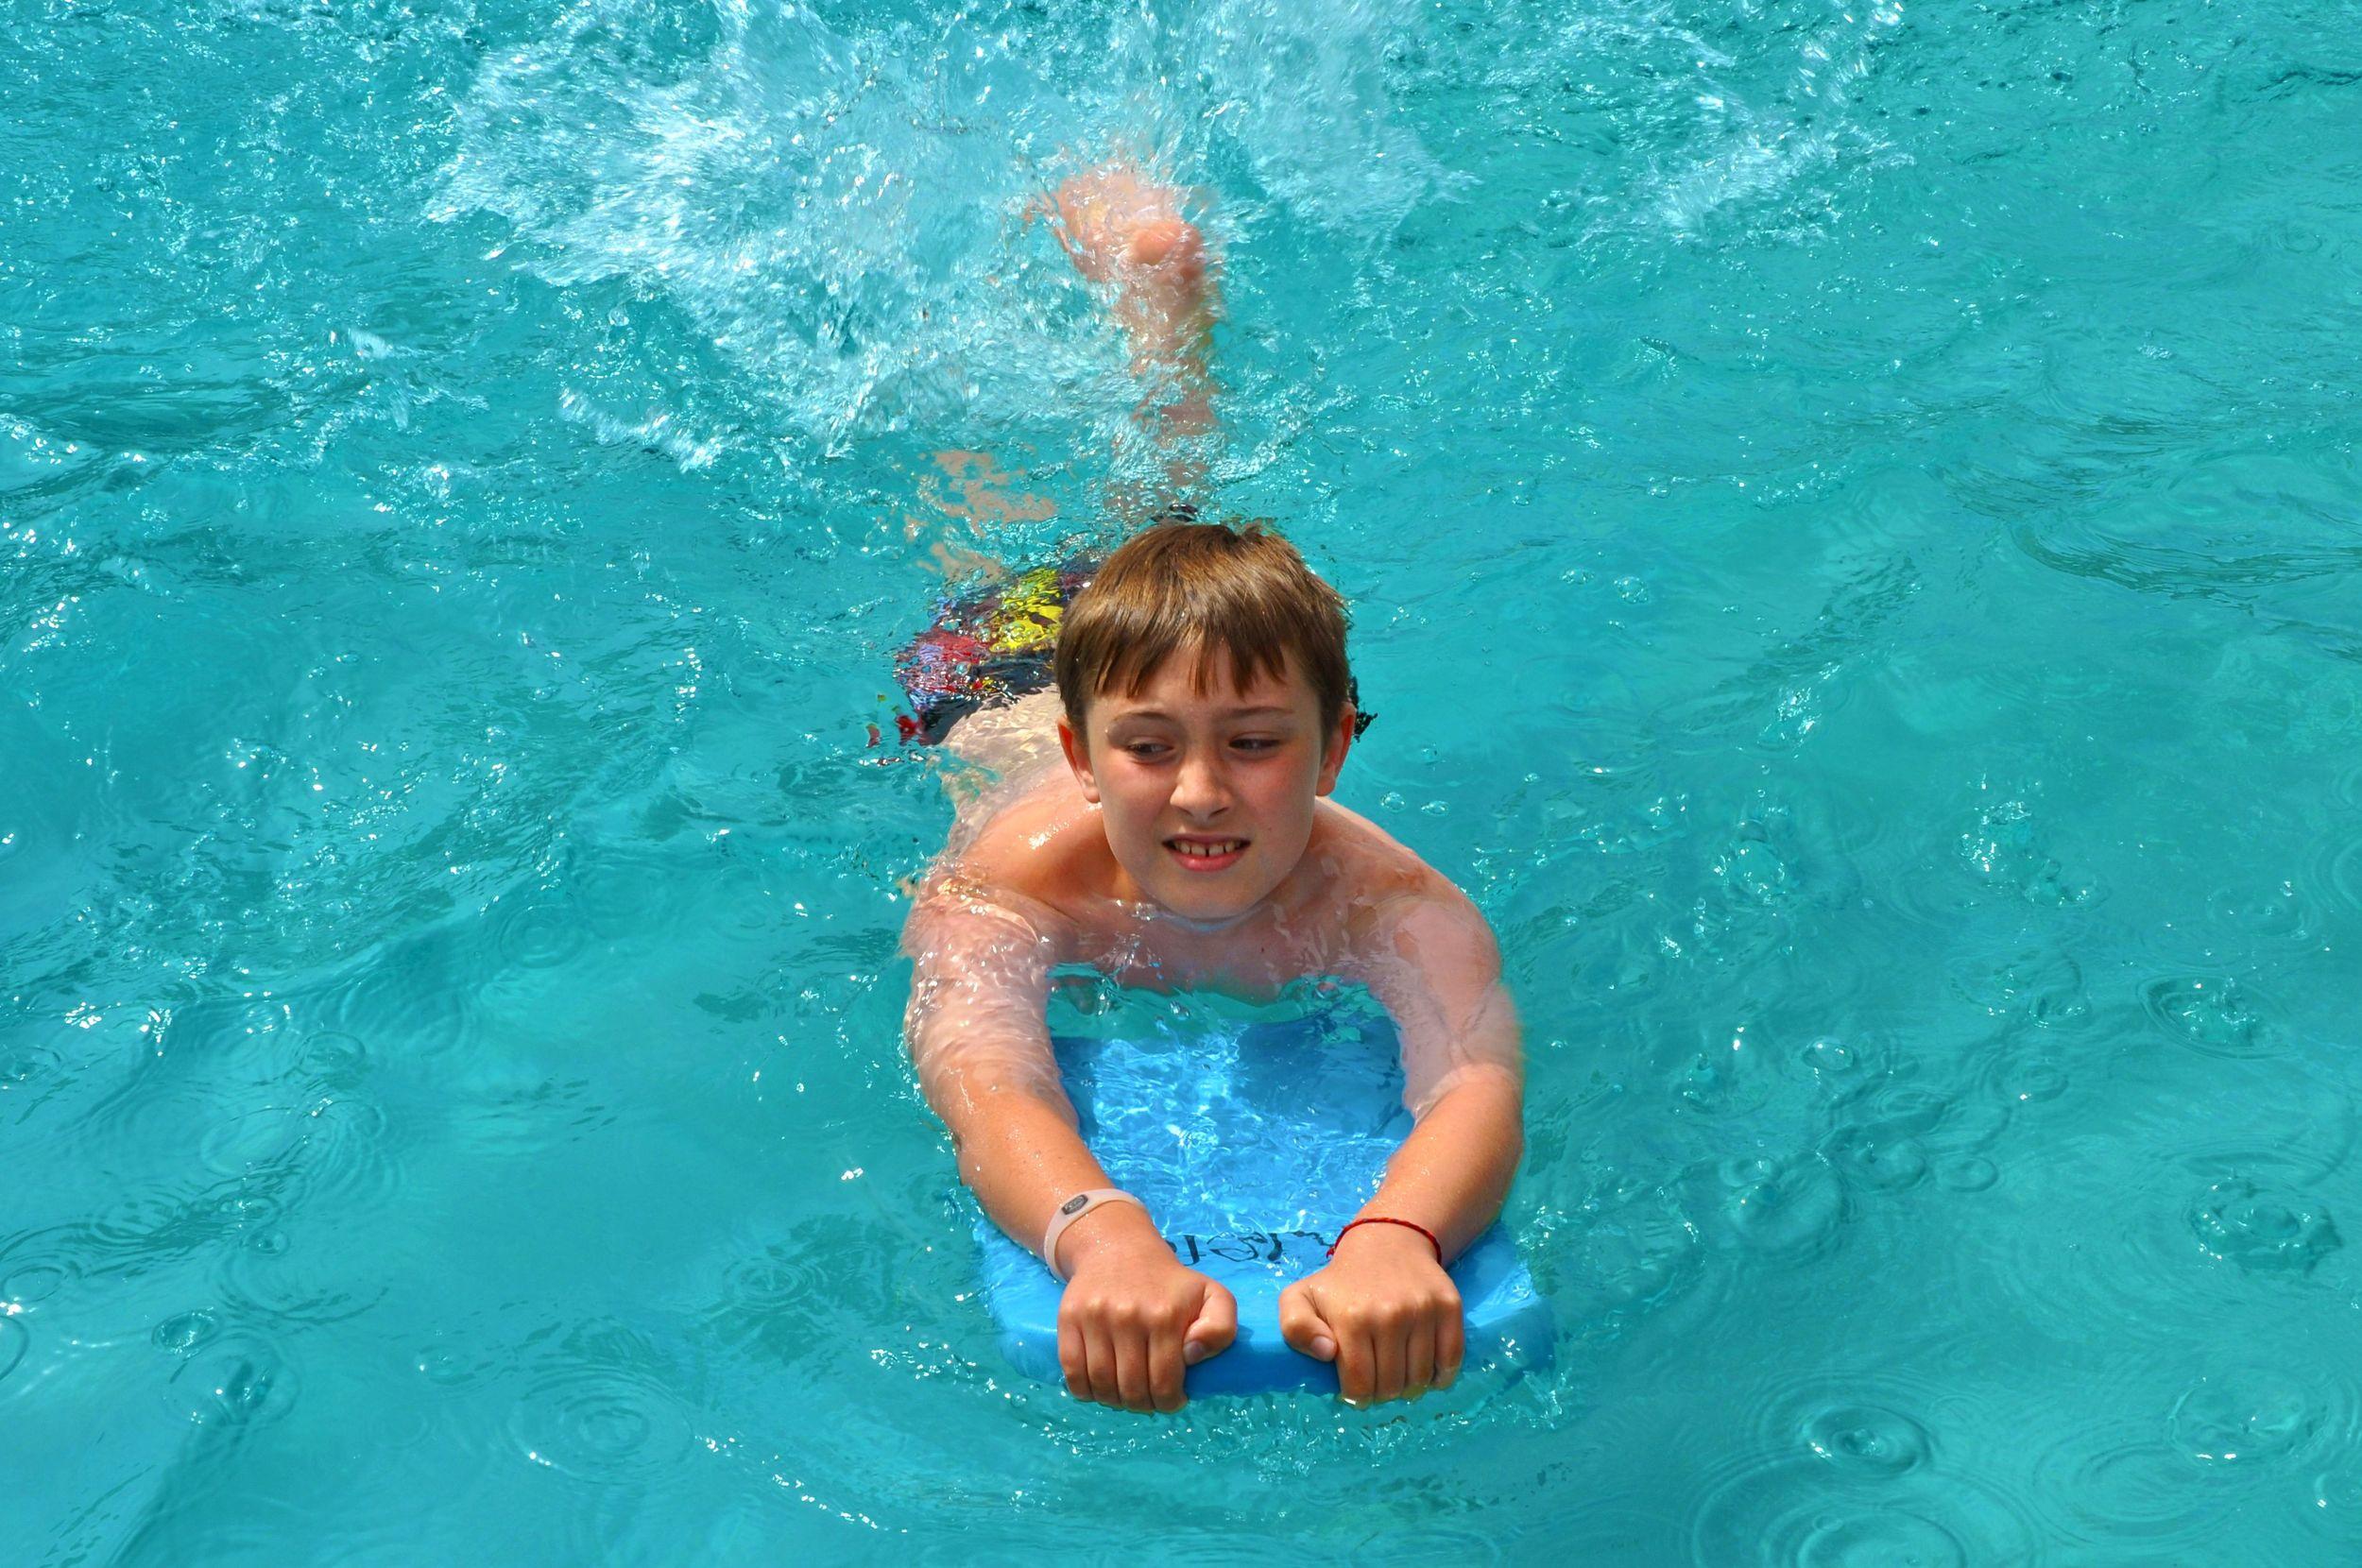 zachary-is-a-fantastic-kicker-in-swimming.jpg